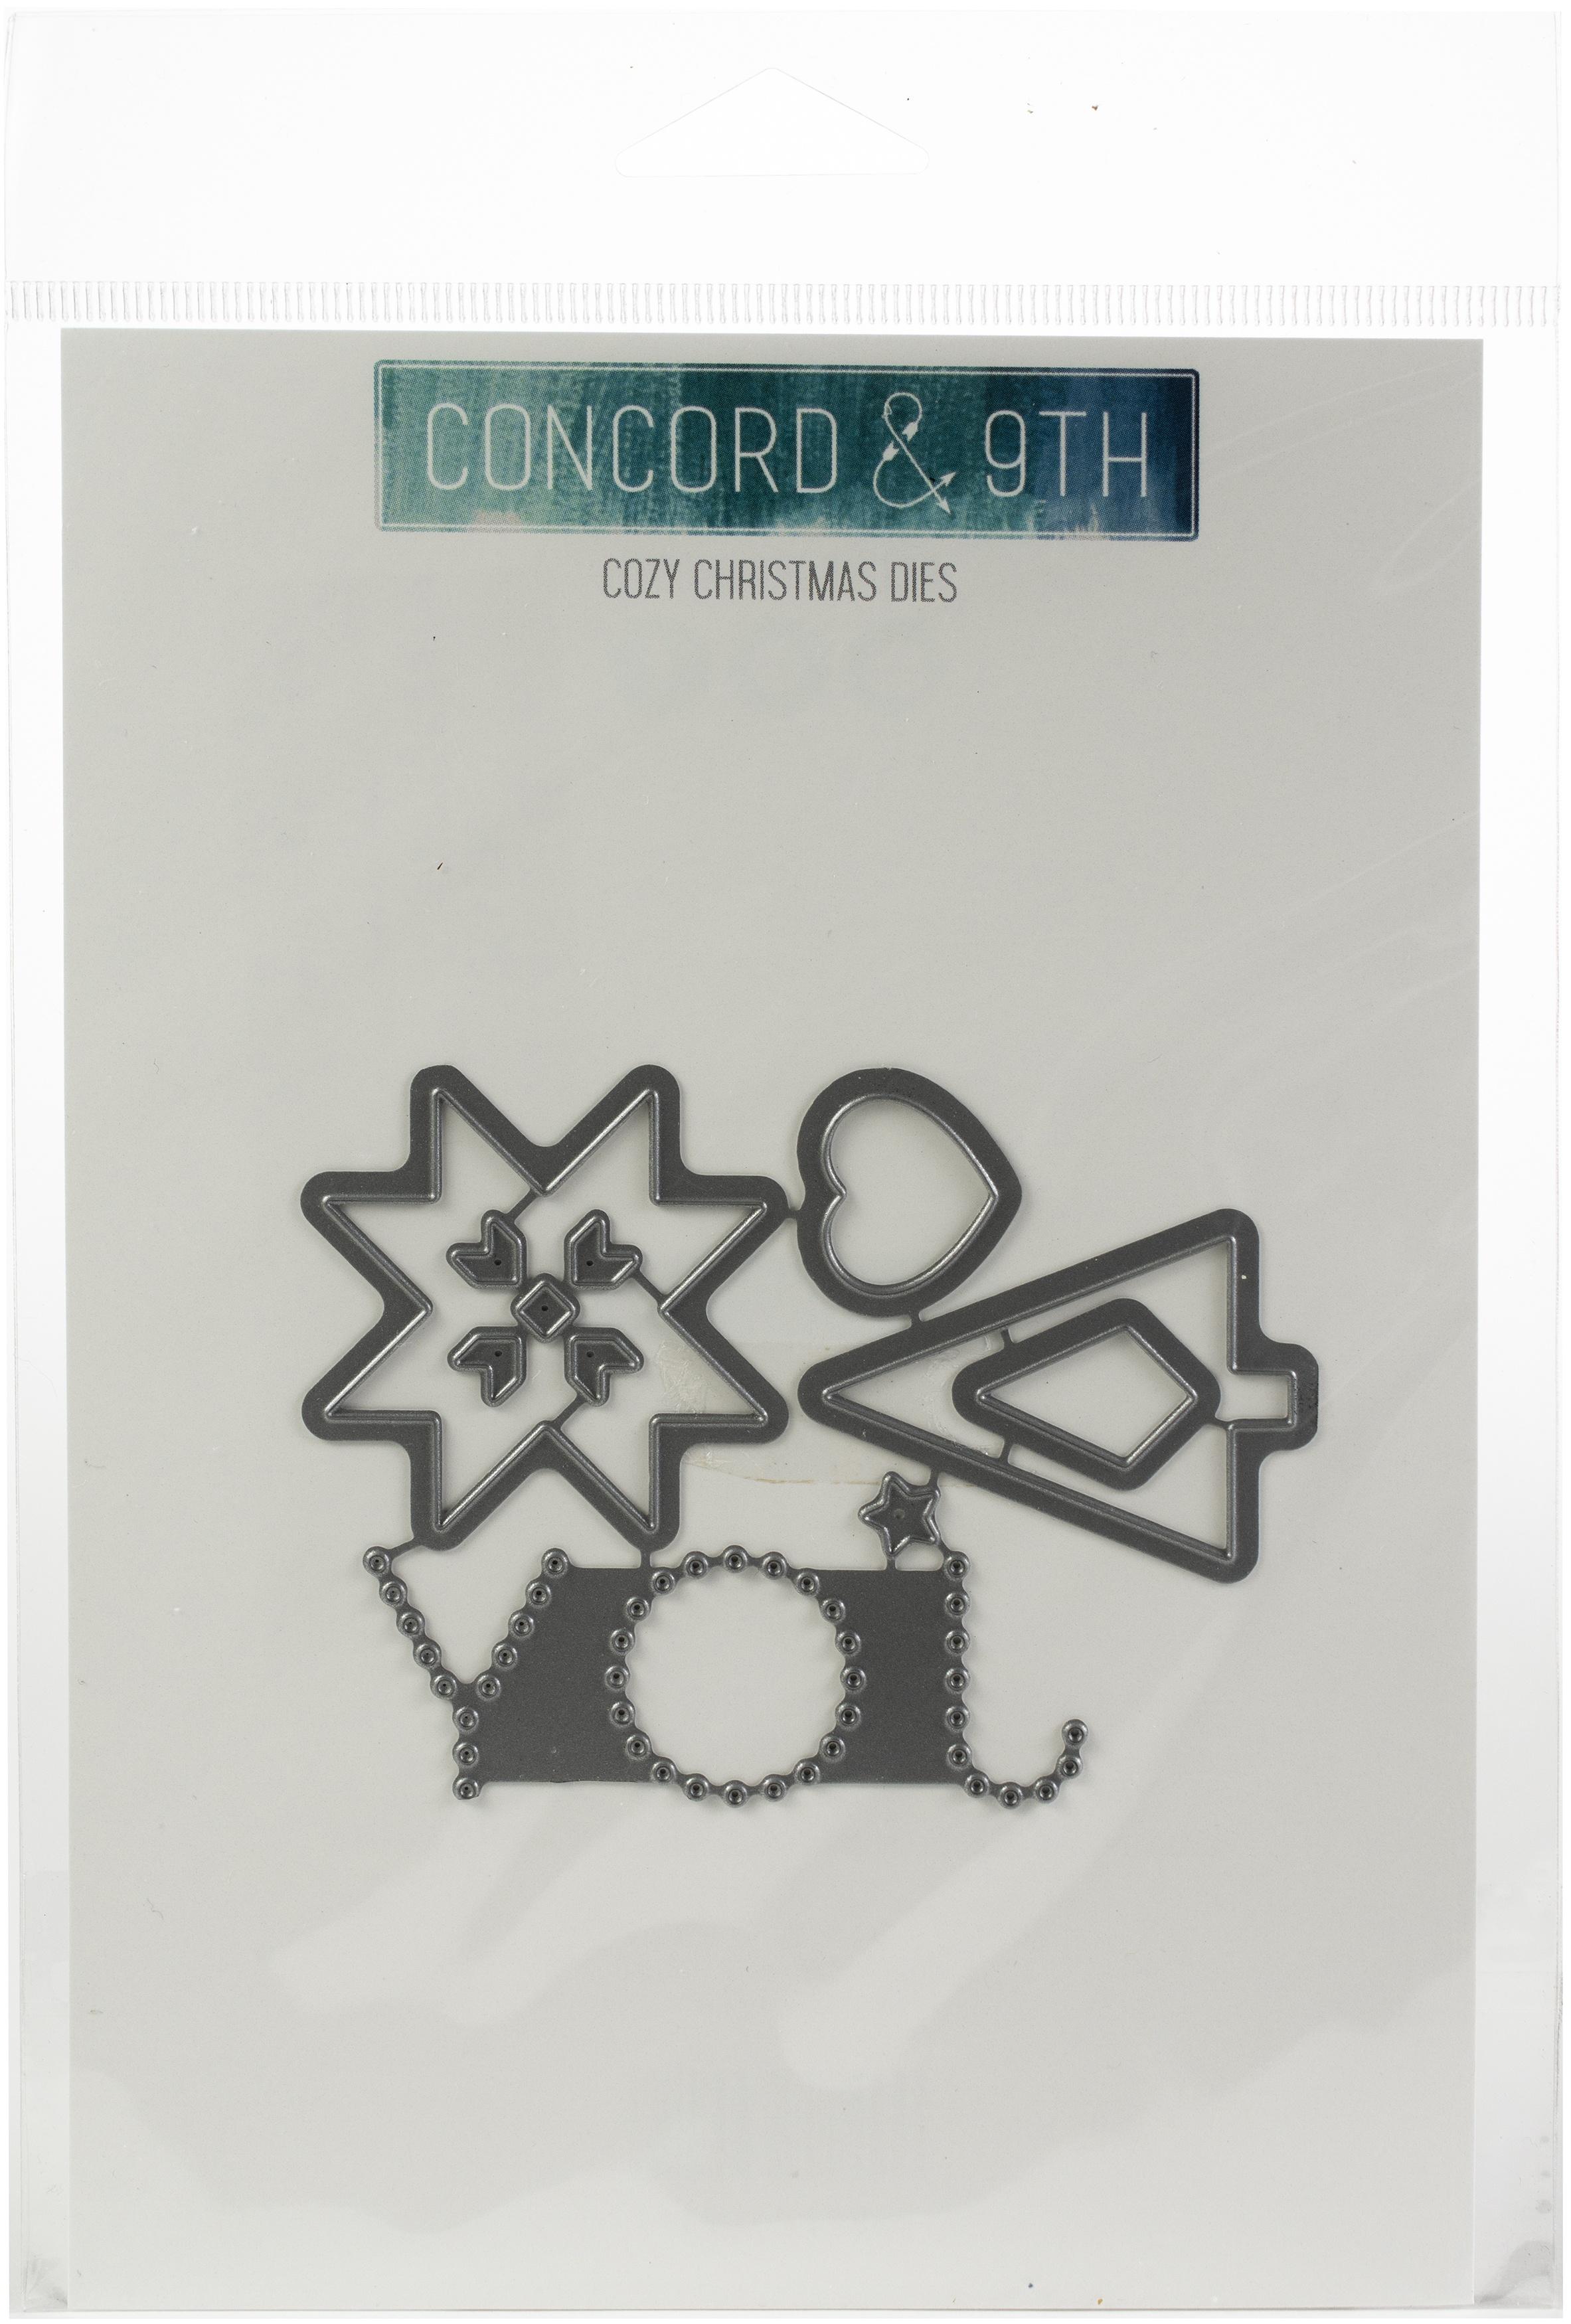 Concord & 9th - Cozy Christmas Die